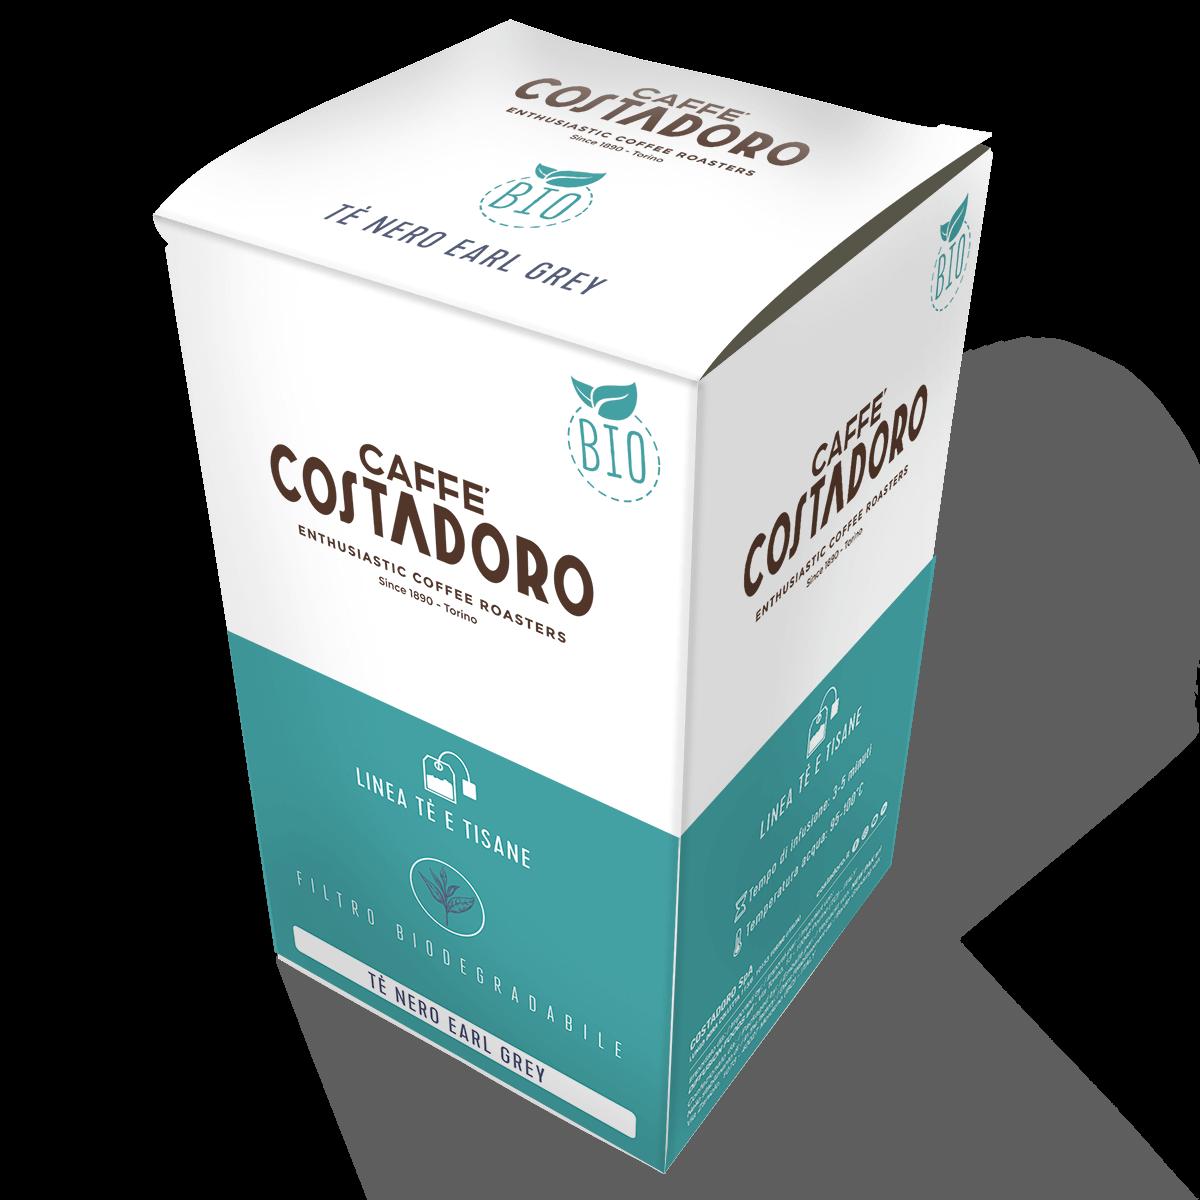 Tè nero Earl Grey – Linea Tè e infusi Costadoro